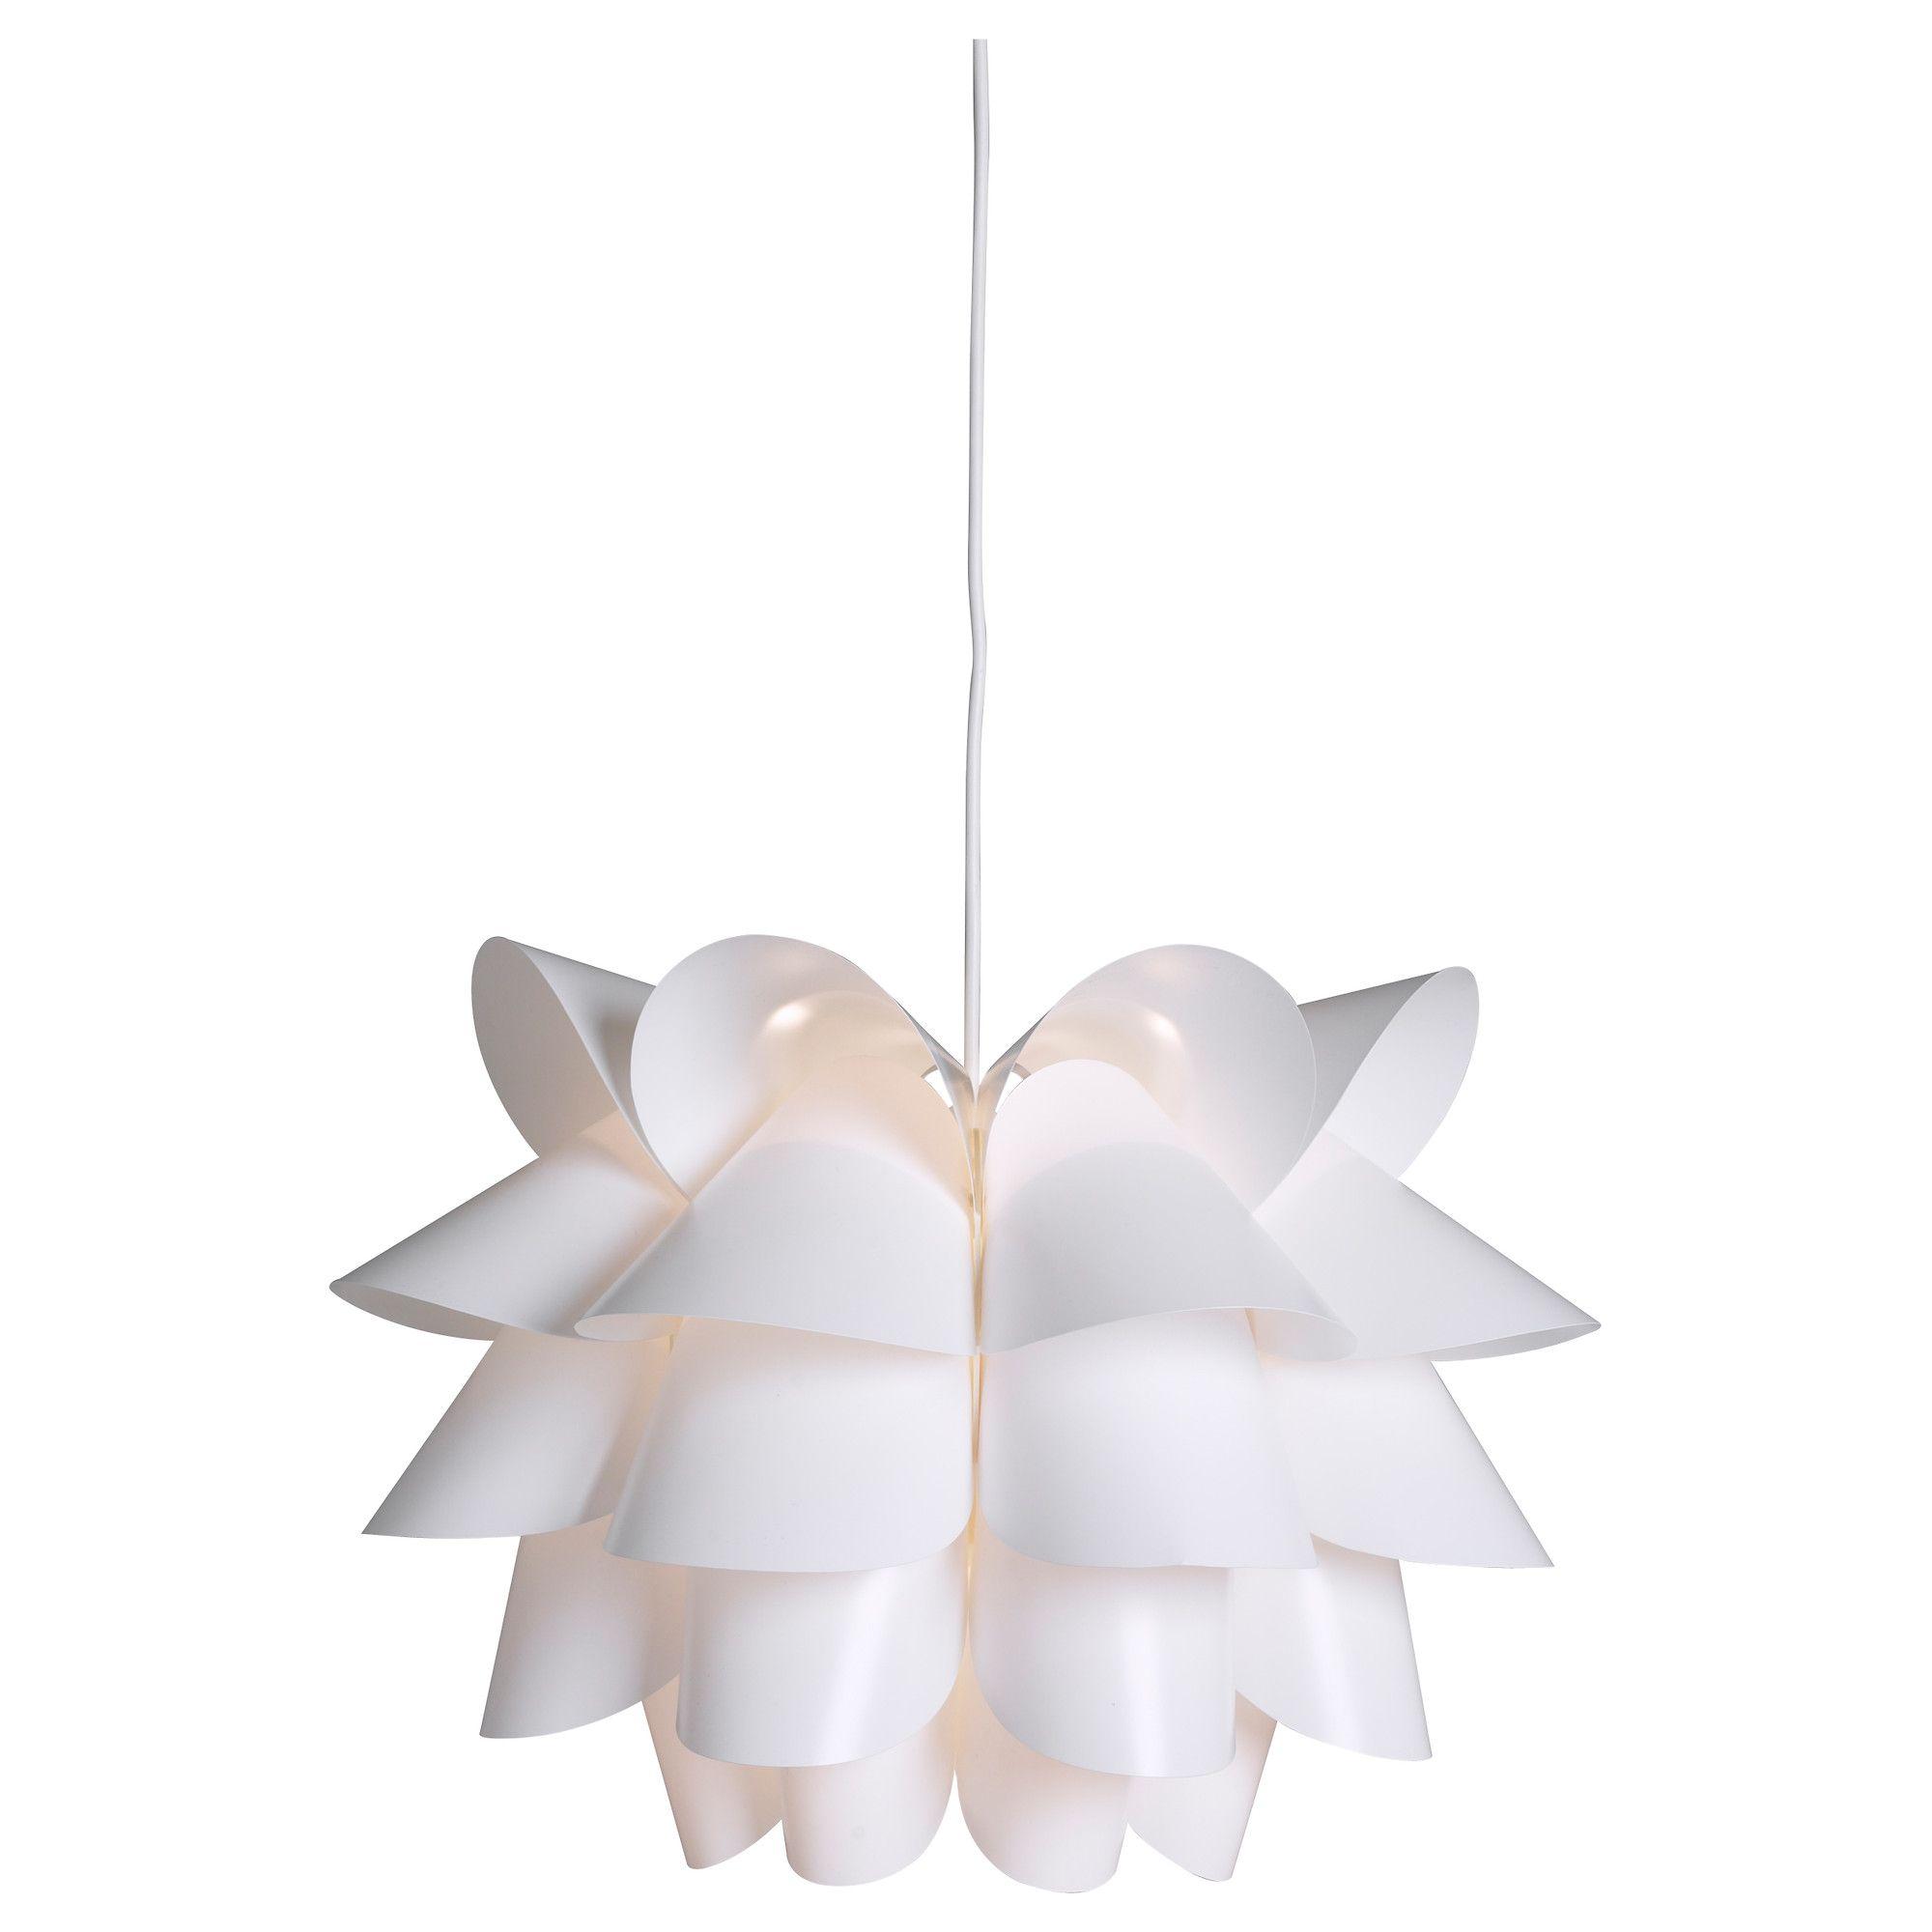 ikea usa lighting. I Really Like This KNAPPA Pendant Lamp From #IKEA , And The Price Is Unbeatable Ikea Usa Lighting T